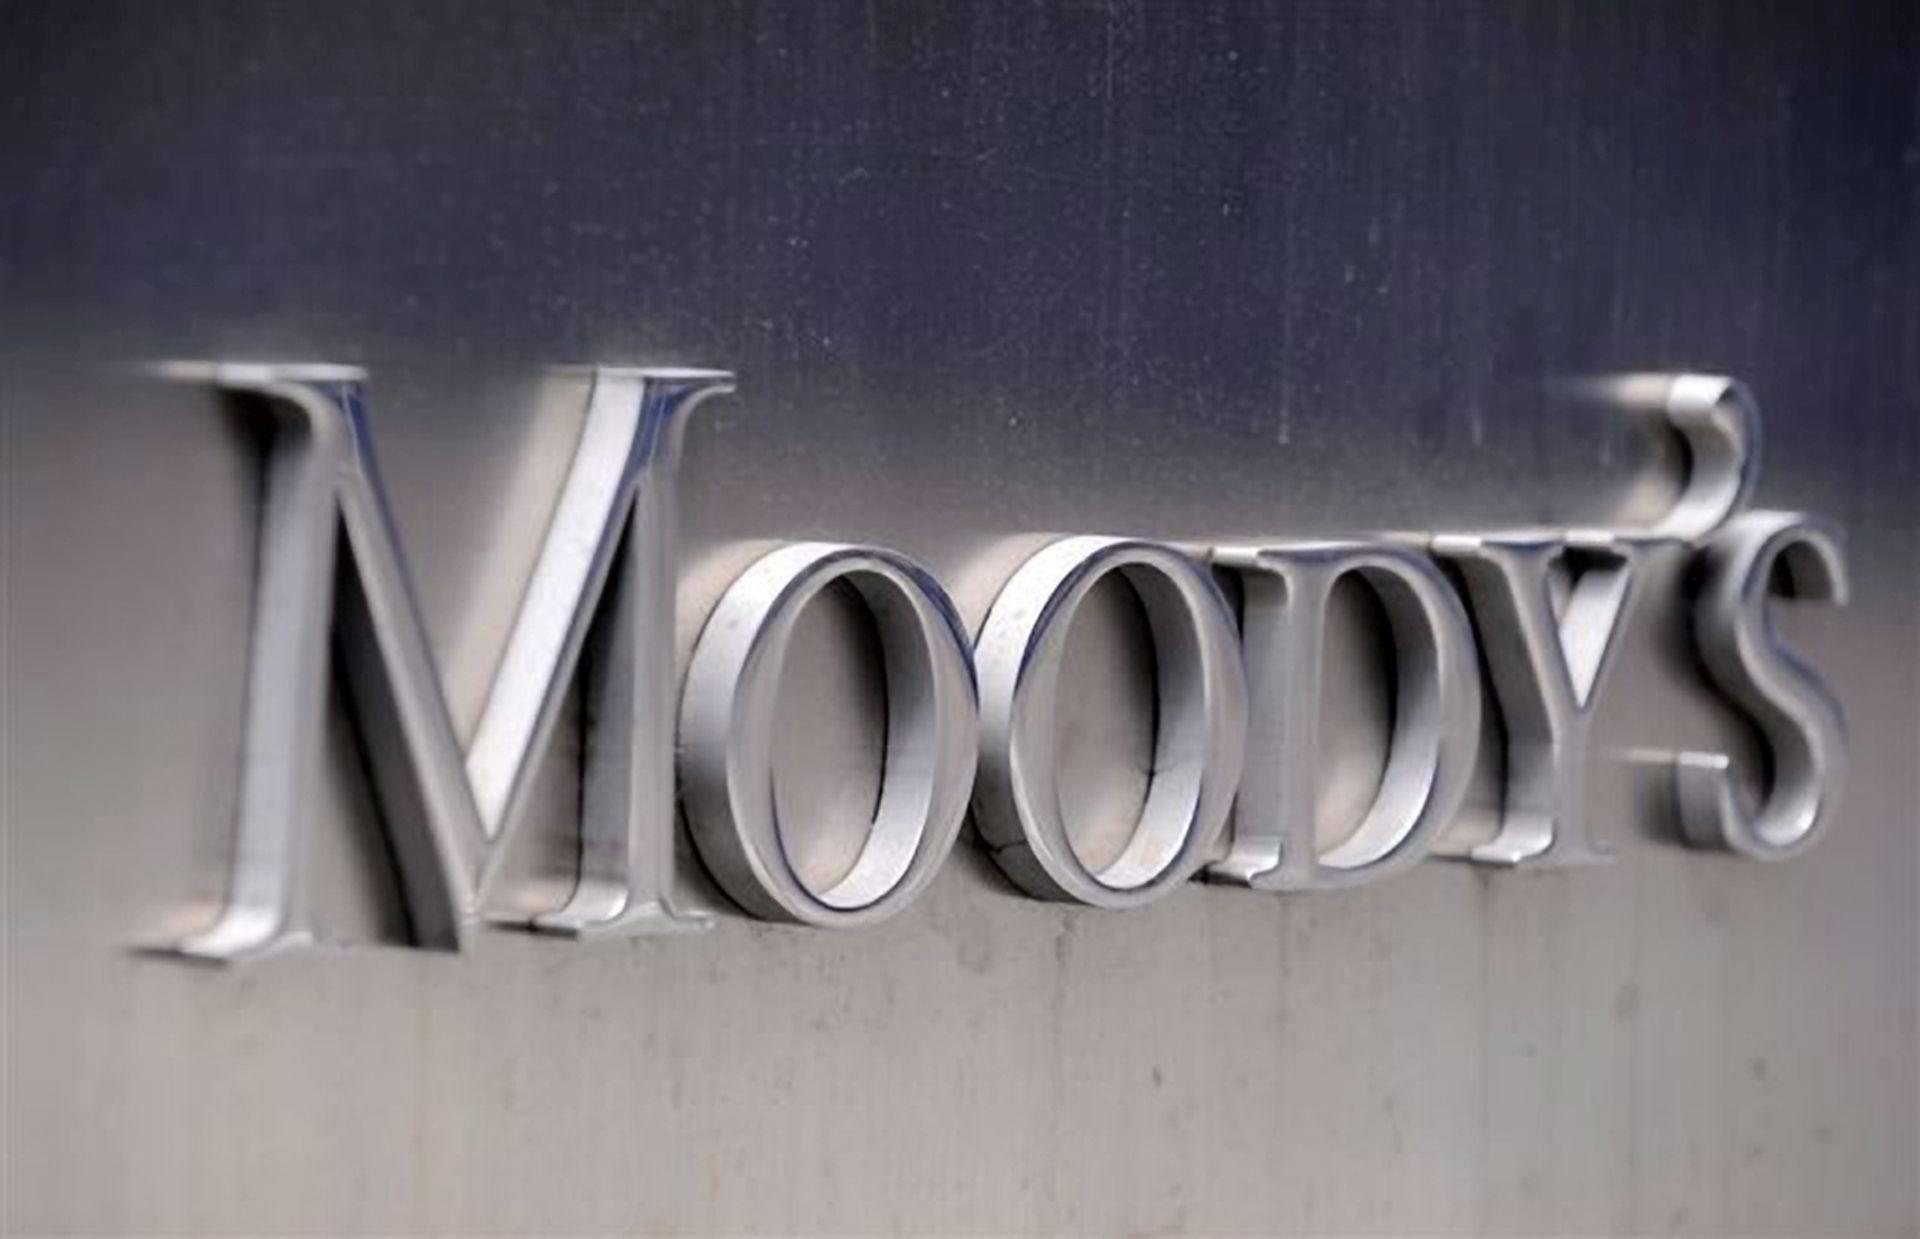 Moody's izabrao Stockholm za novo europsko sjedište nakon Brexita